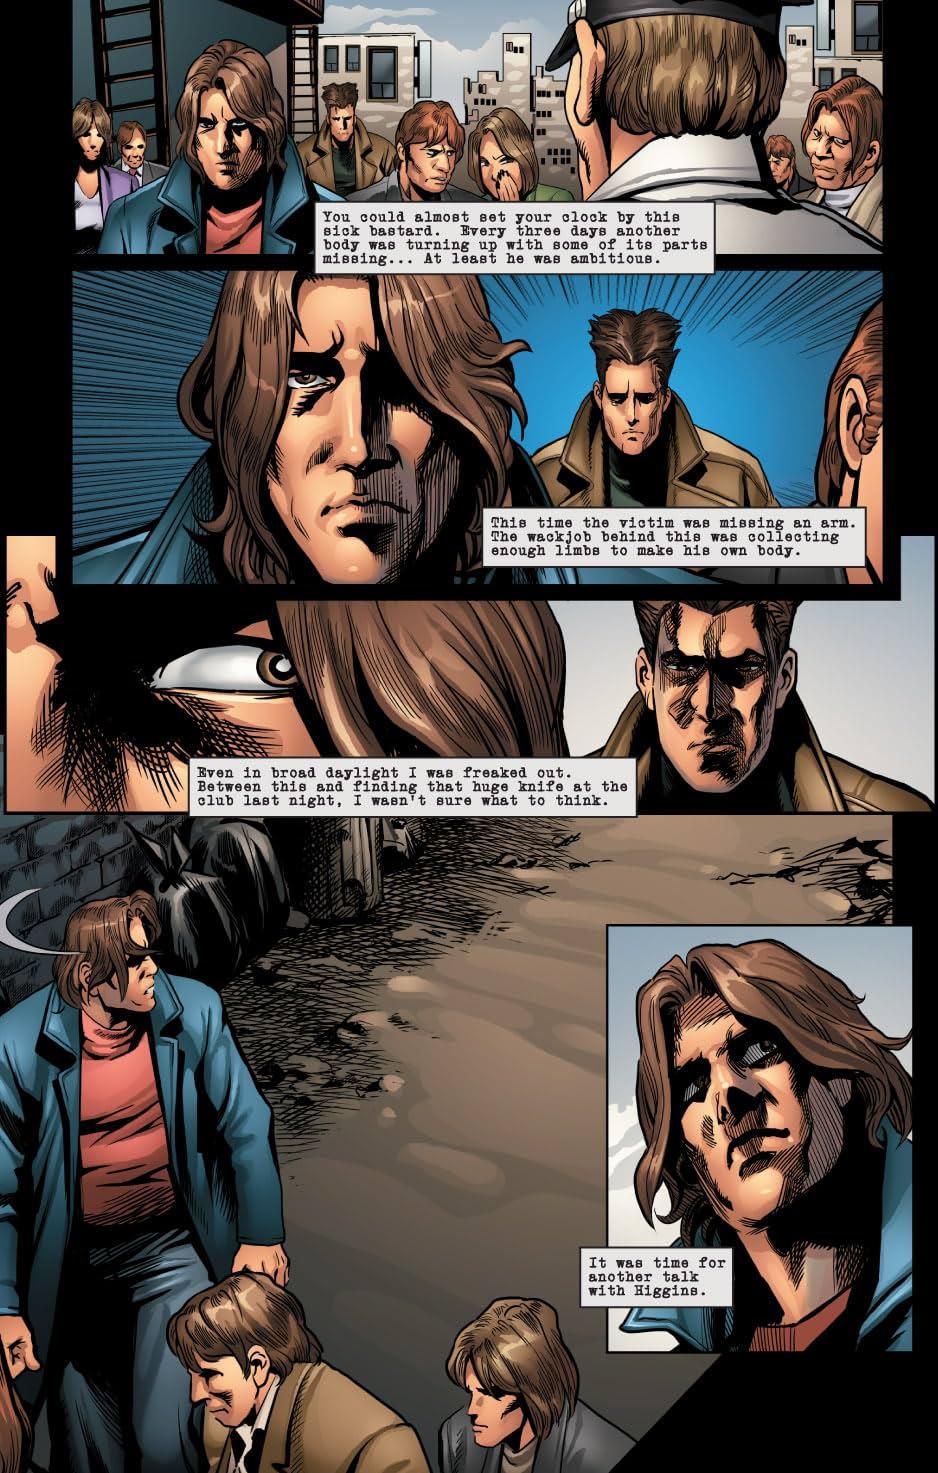 Sins of the Fallen #2: The Nightstalker